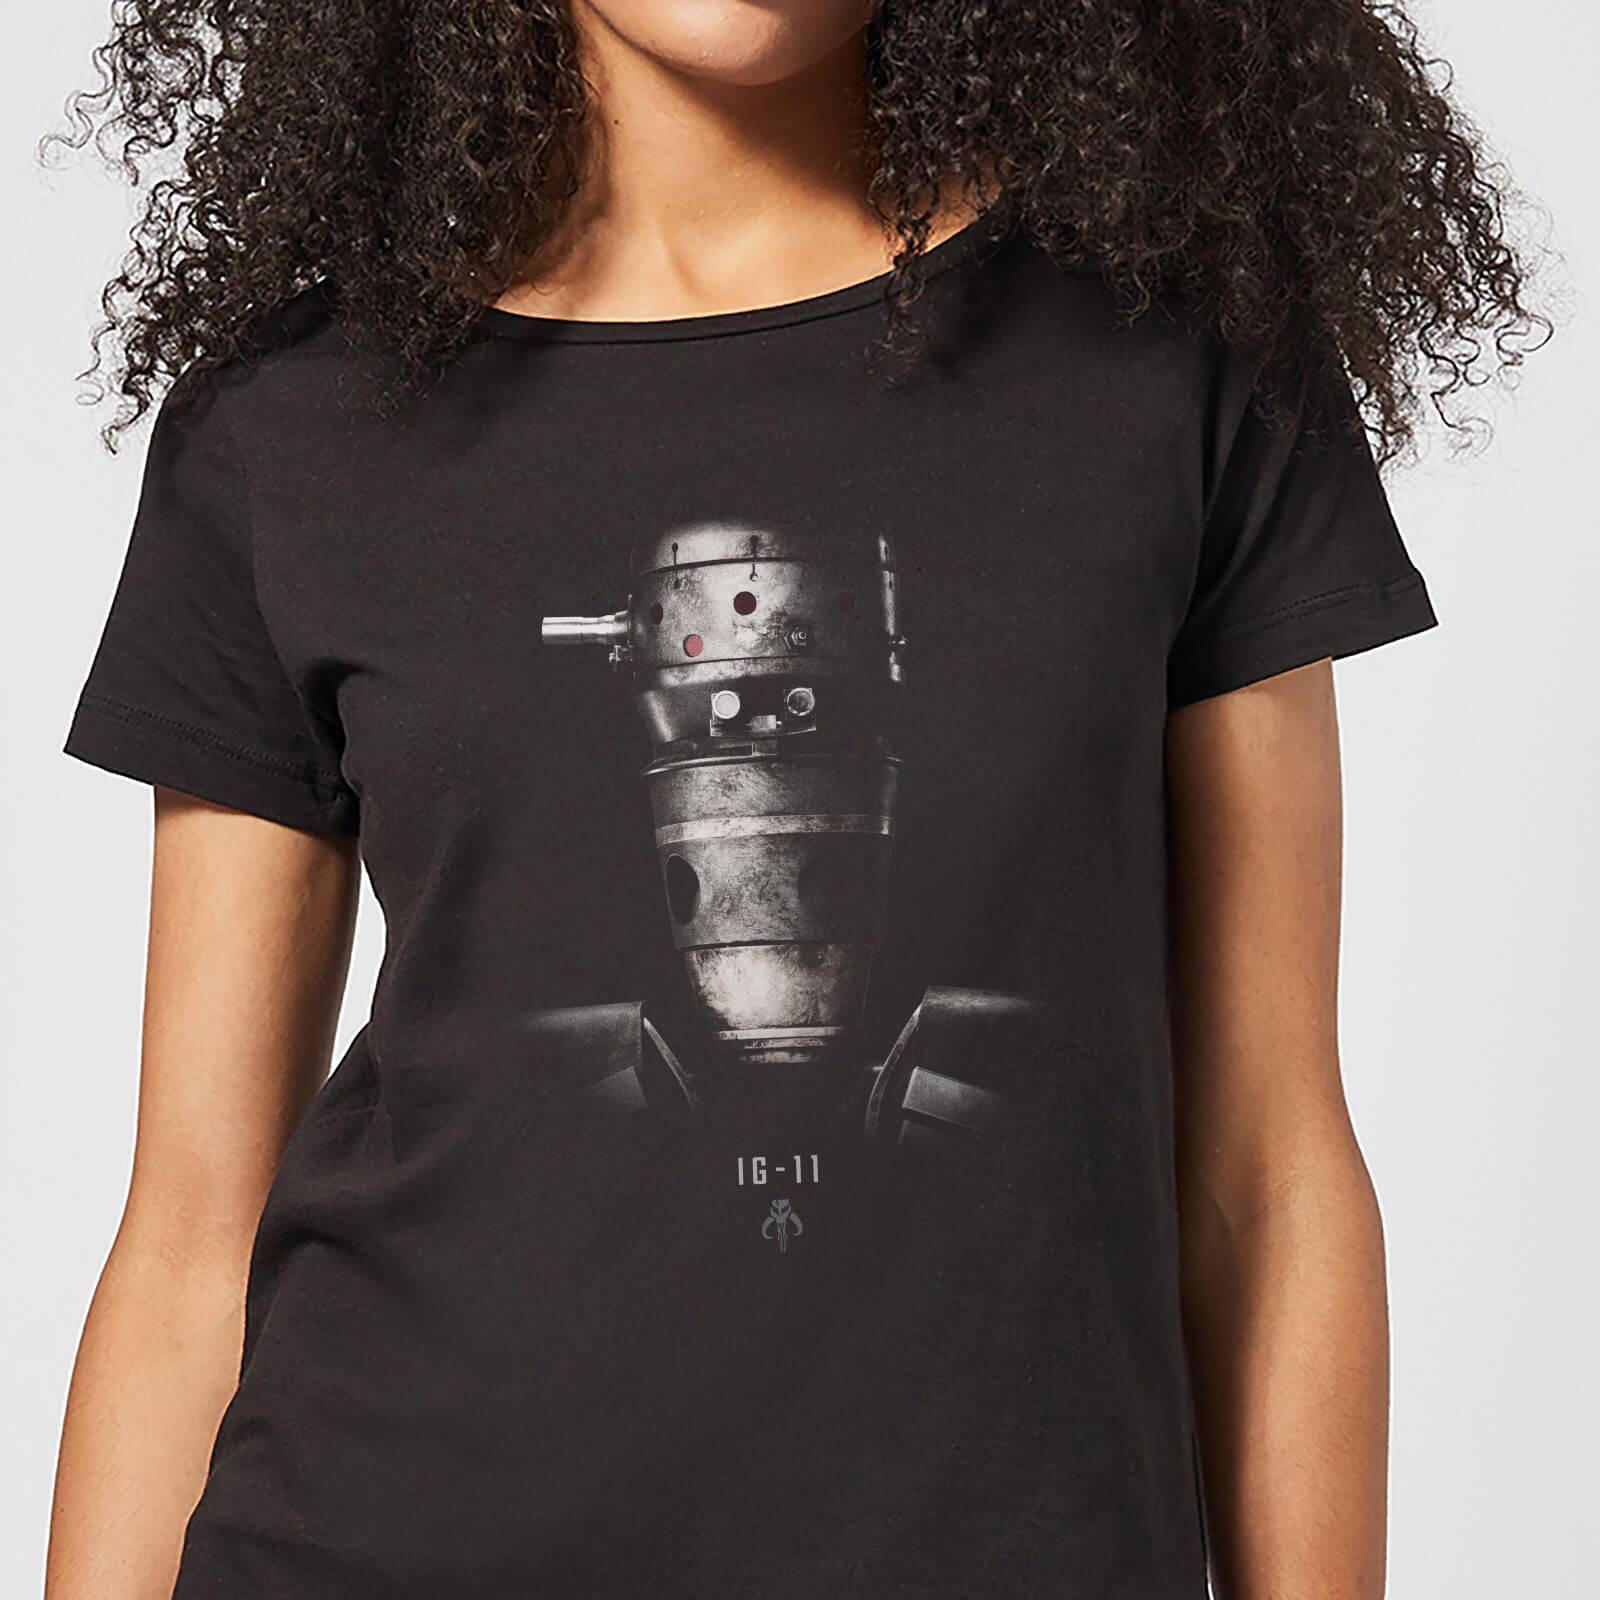 The Mandalorian IG-11 Poster Women's T-Shirt - Black - XXL - Schwarz